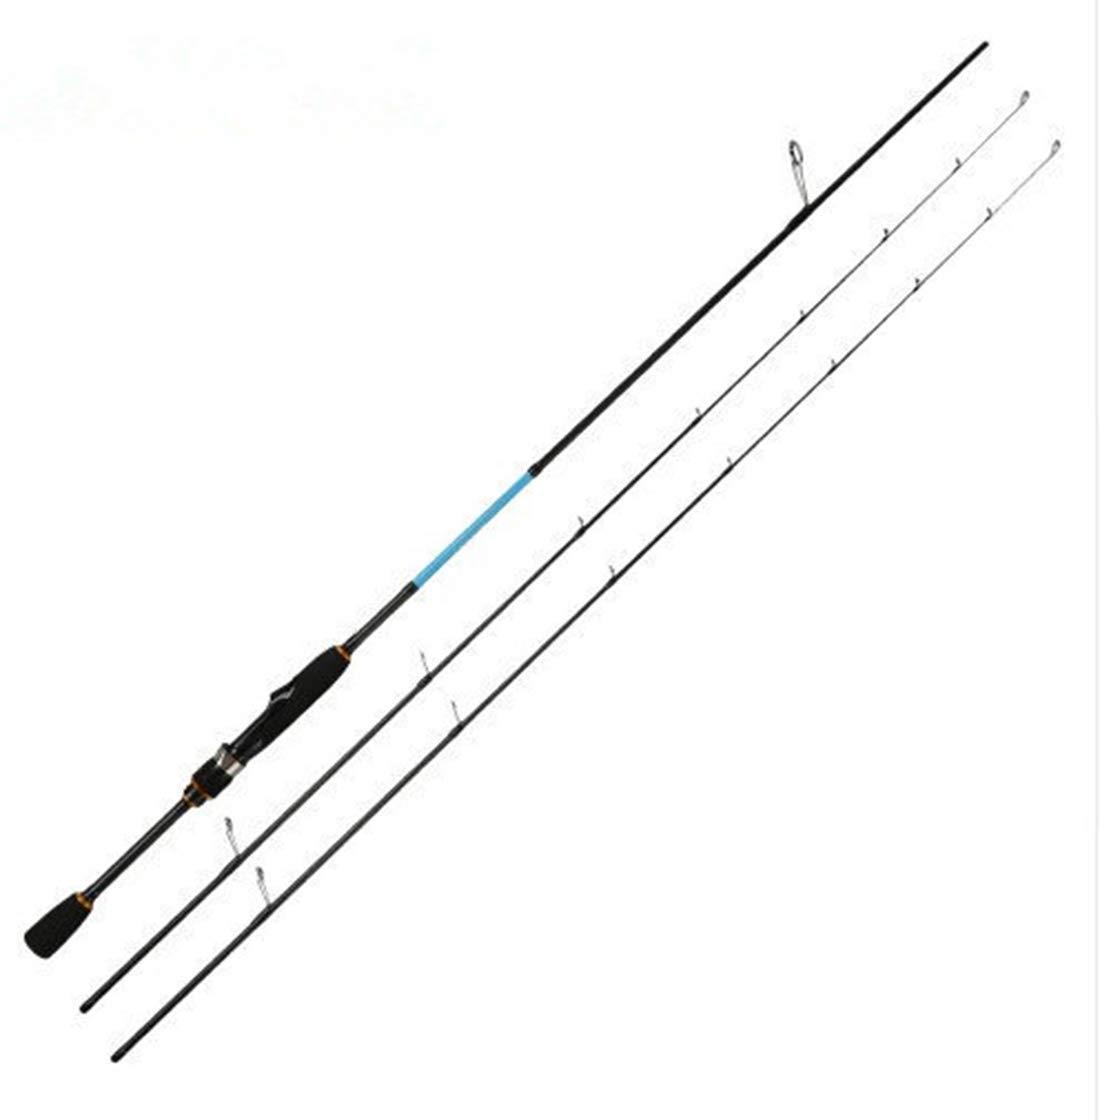 YIJUPIN 釣り竿釣り用品釣り竿炭素鋼棒池リバーサイドに適した 192CM  B07QGWM1M2